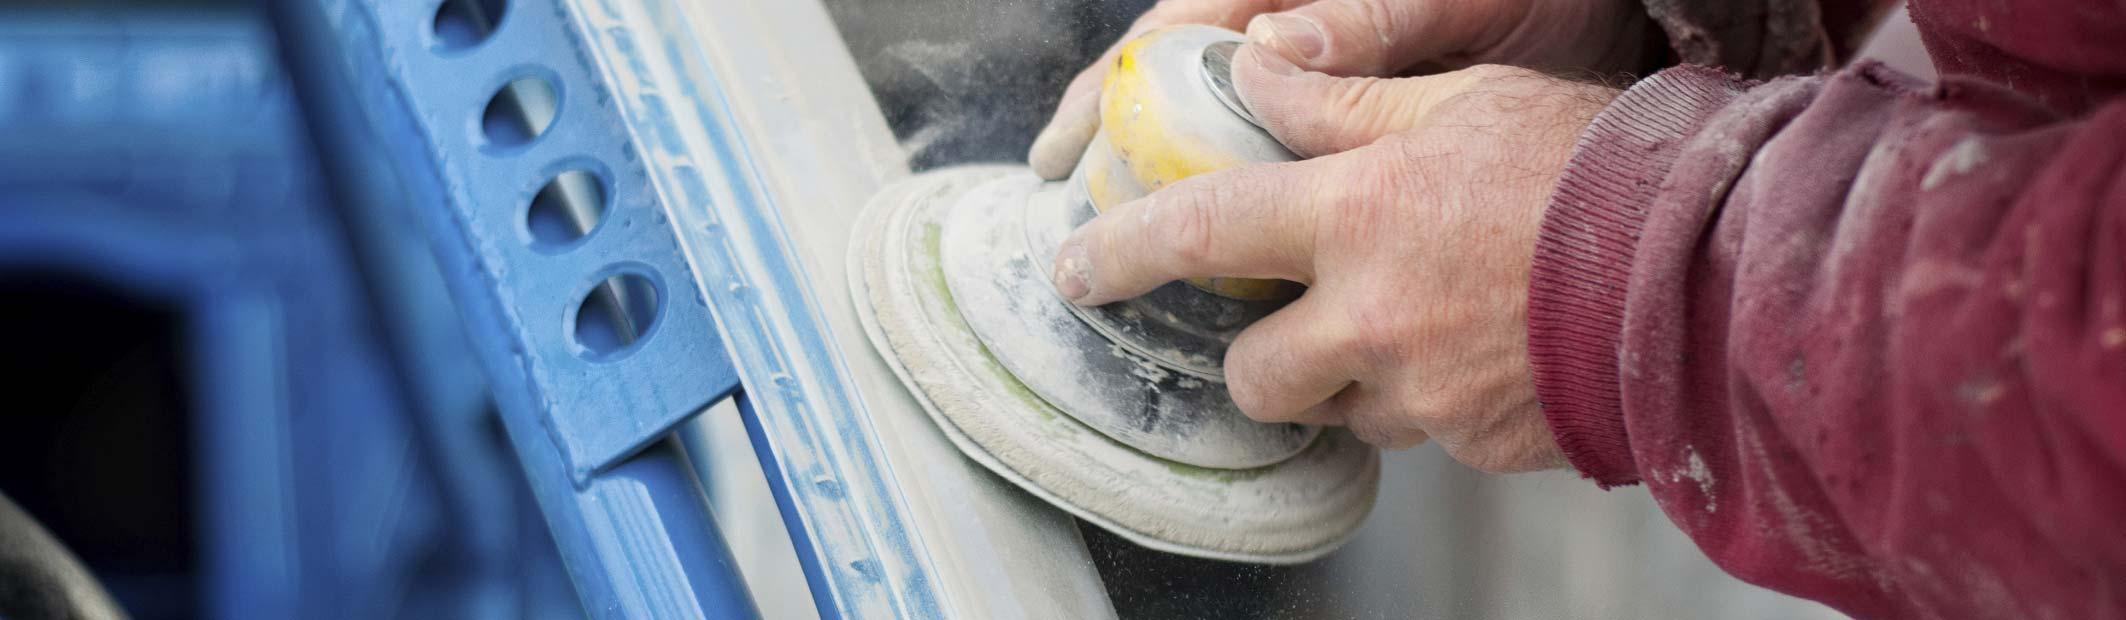 hi tech powder coating and sandblasting sanding